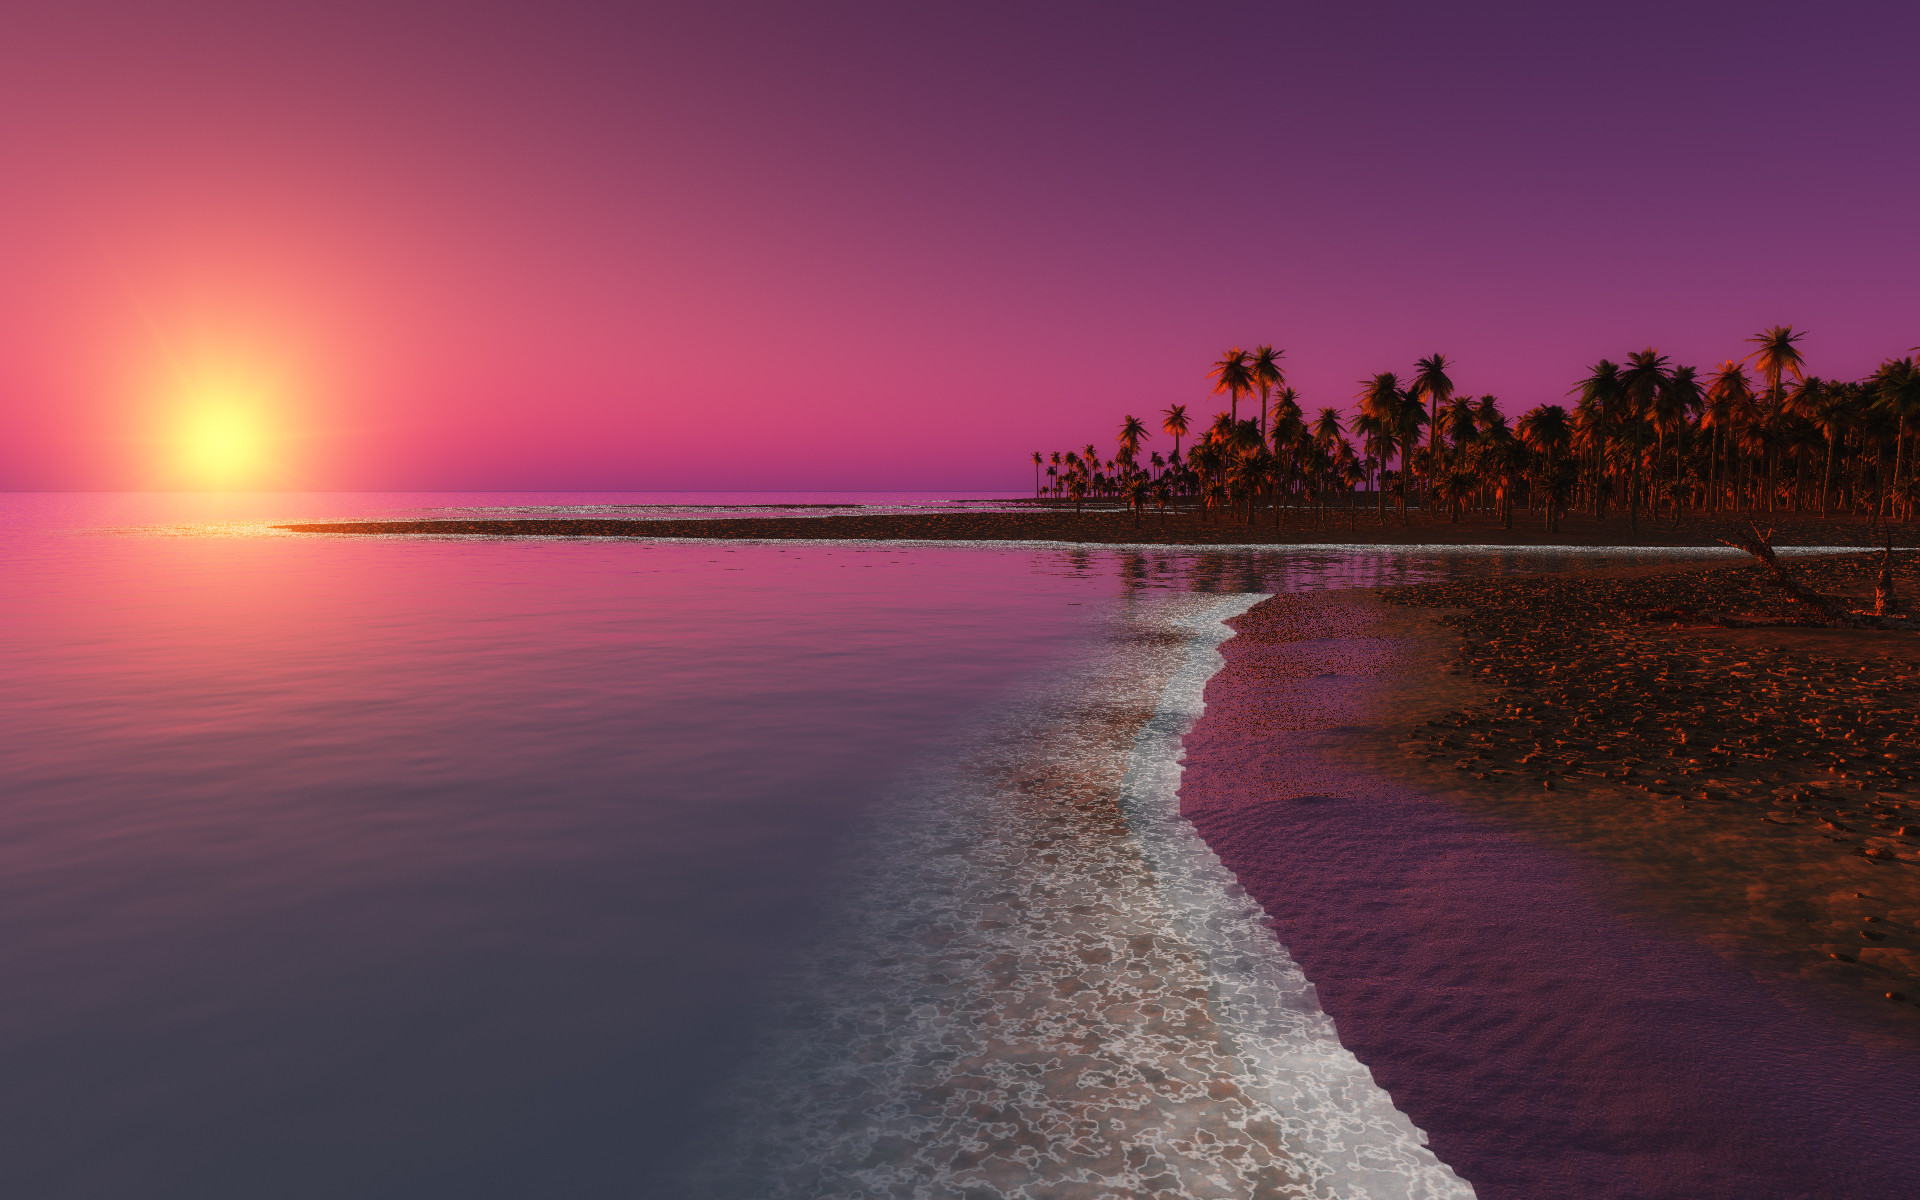 Res: 1920x1200, Red Sunset over the Ocean, Desktop Wallpaper